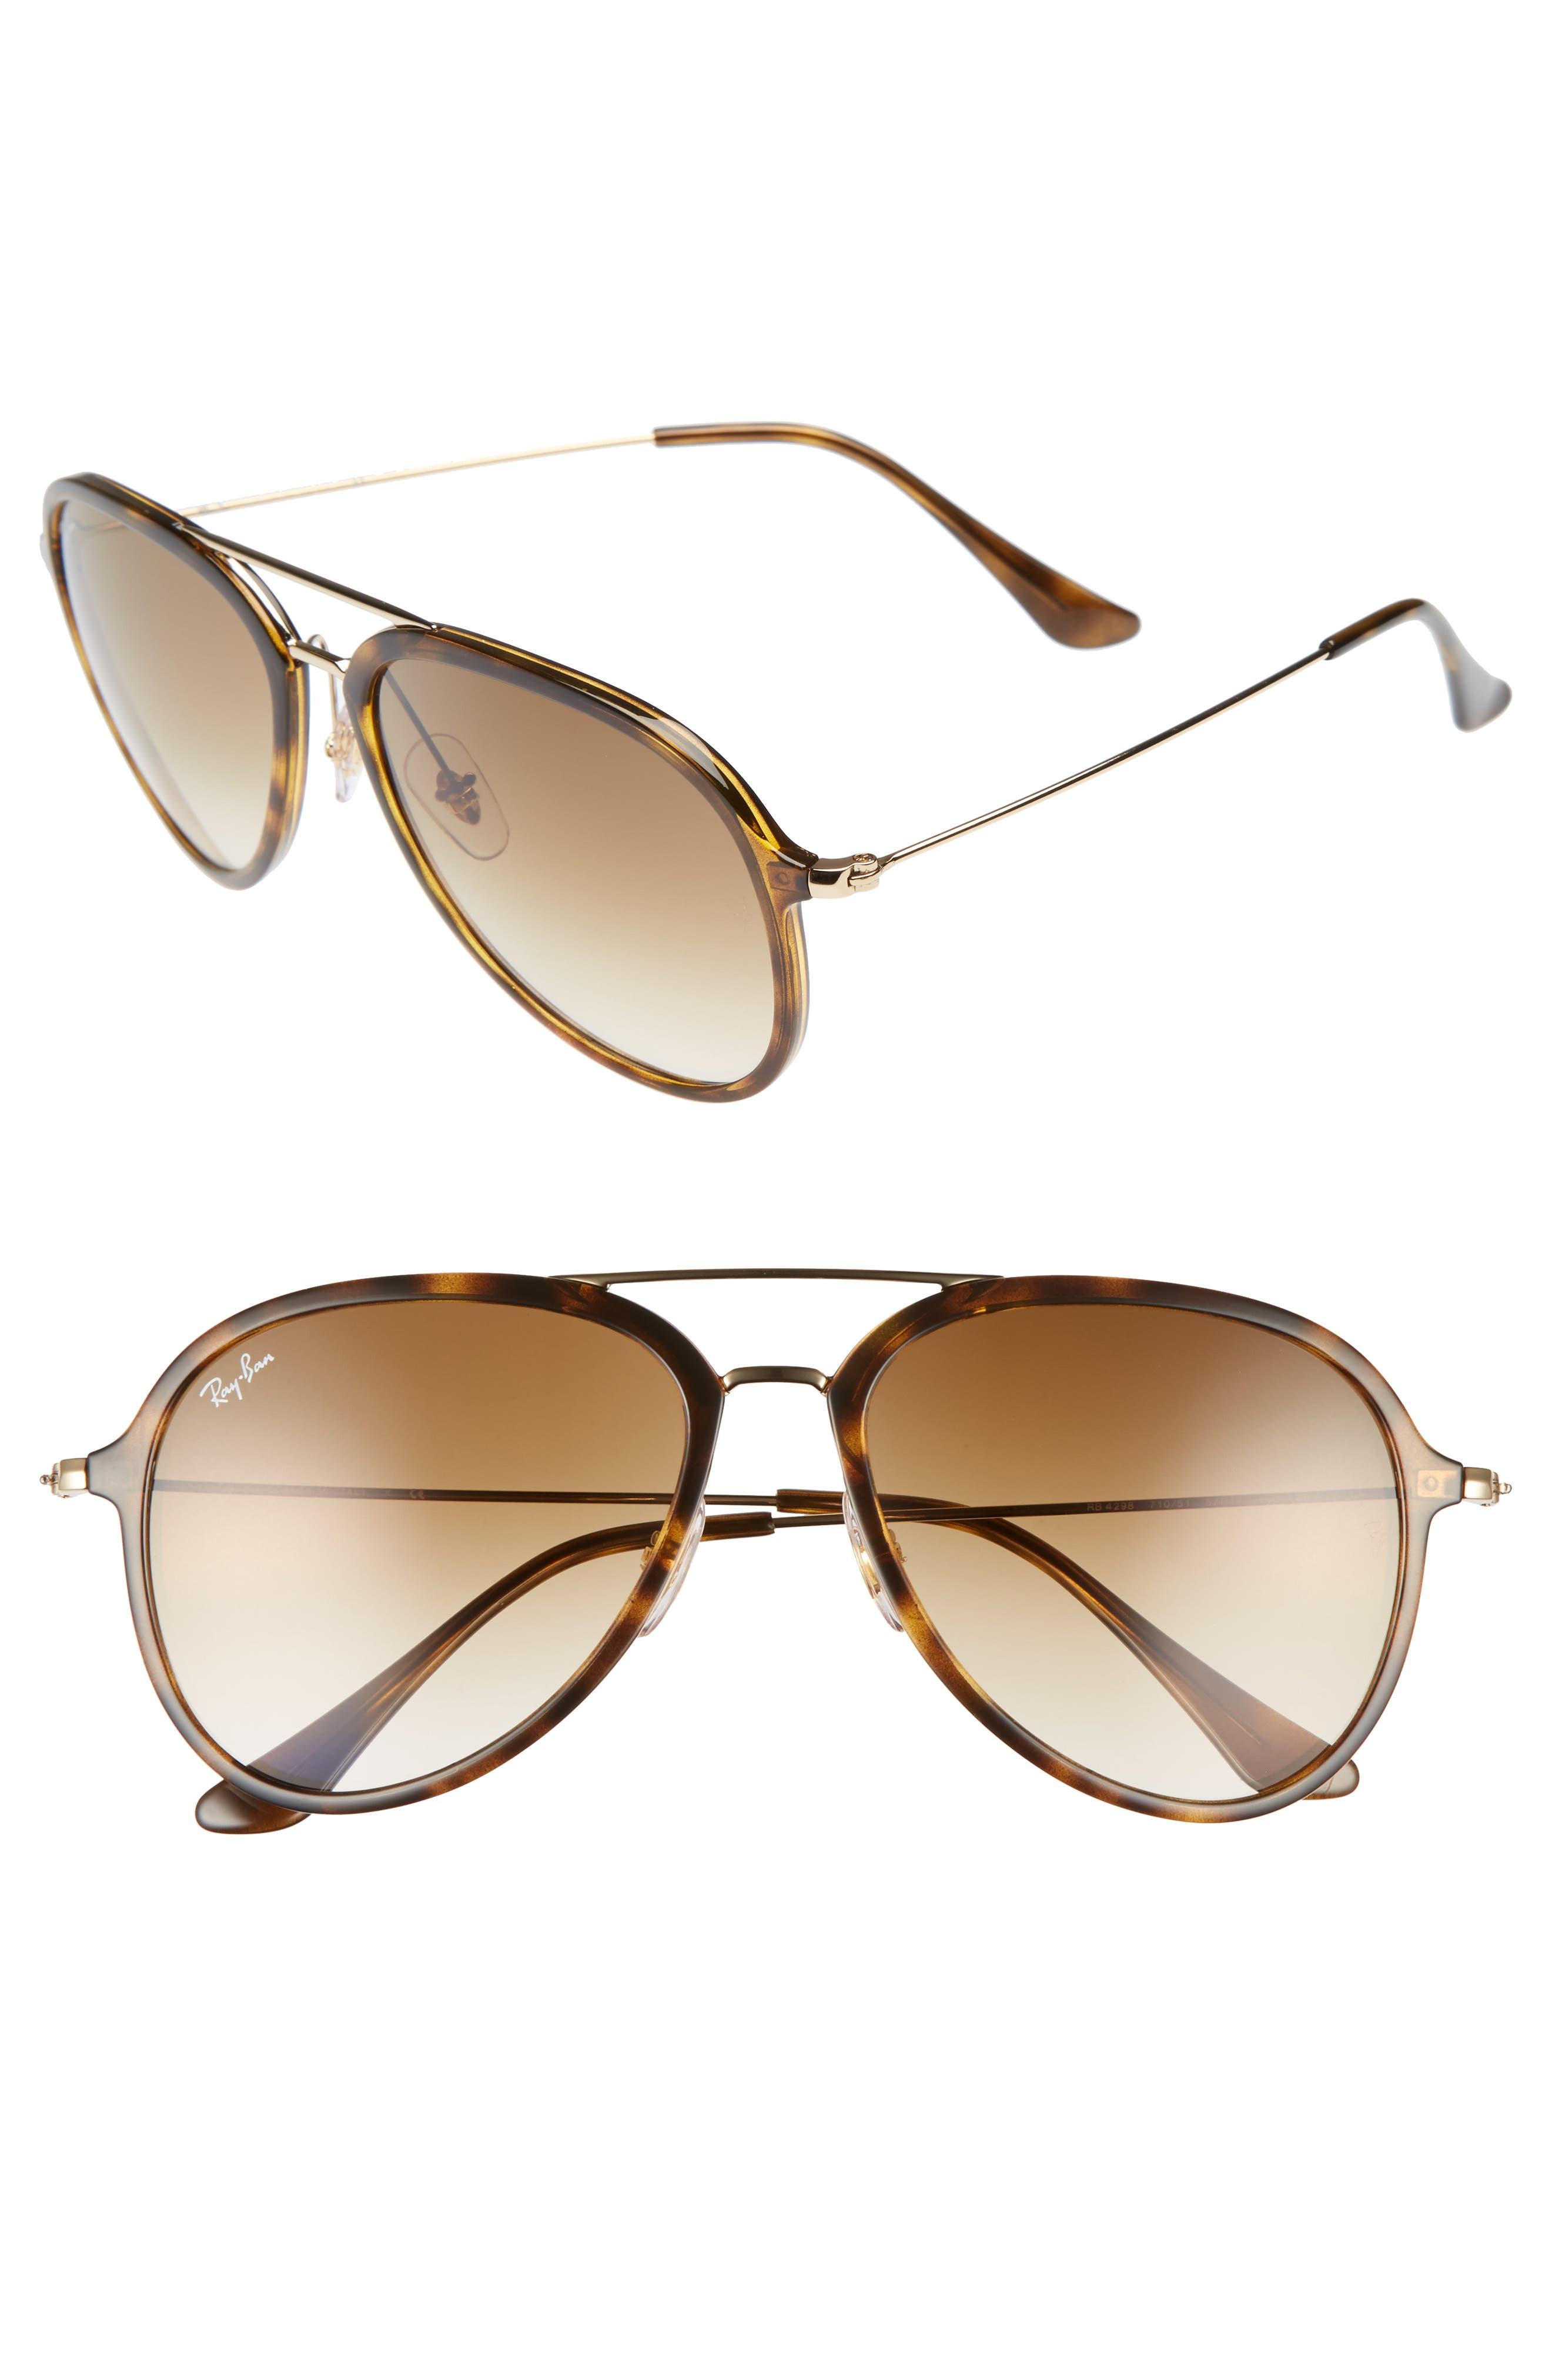 57mm Pilot Sunglasses,                         Main,                         color, LIGHT HAVANA